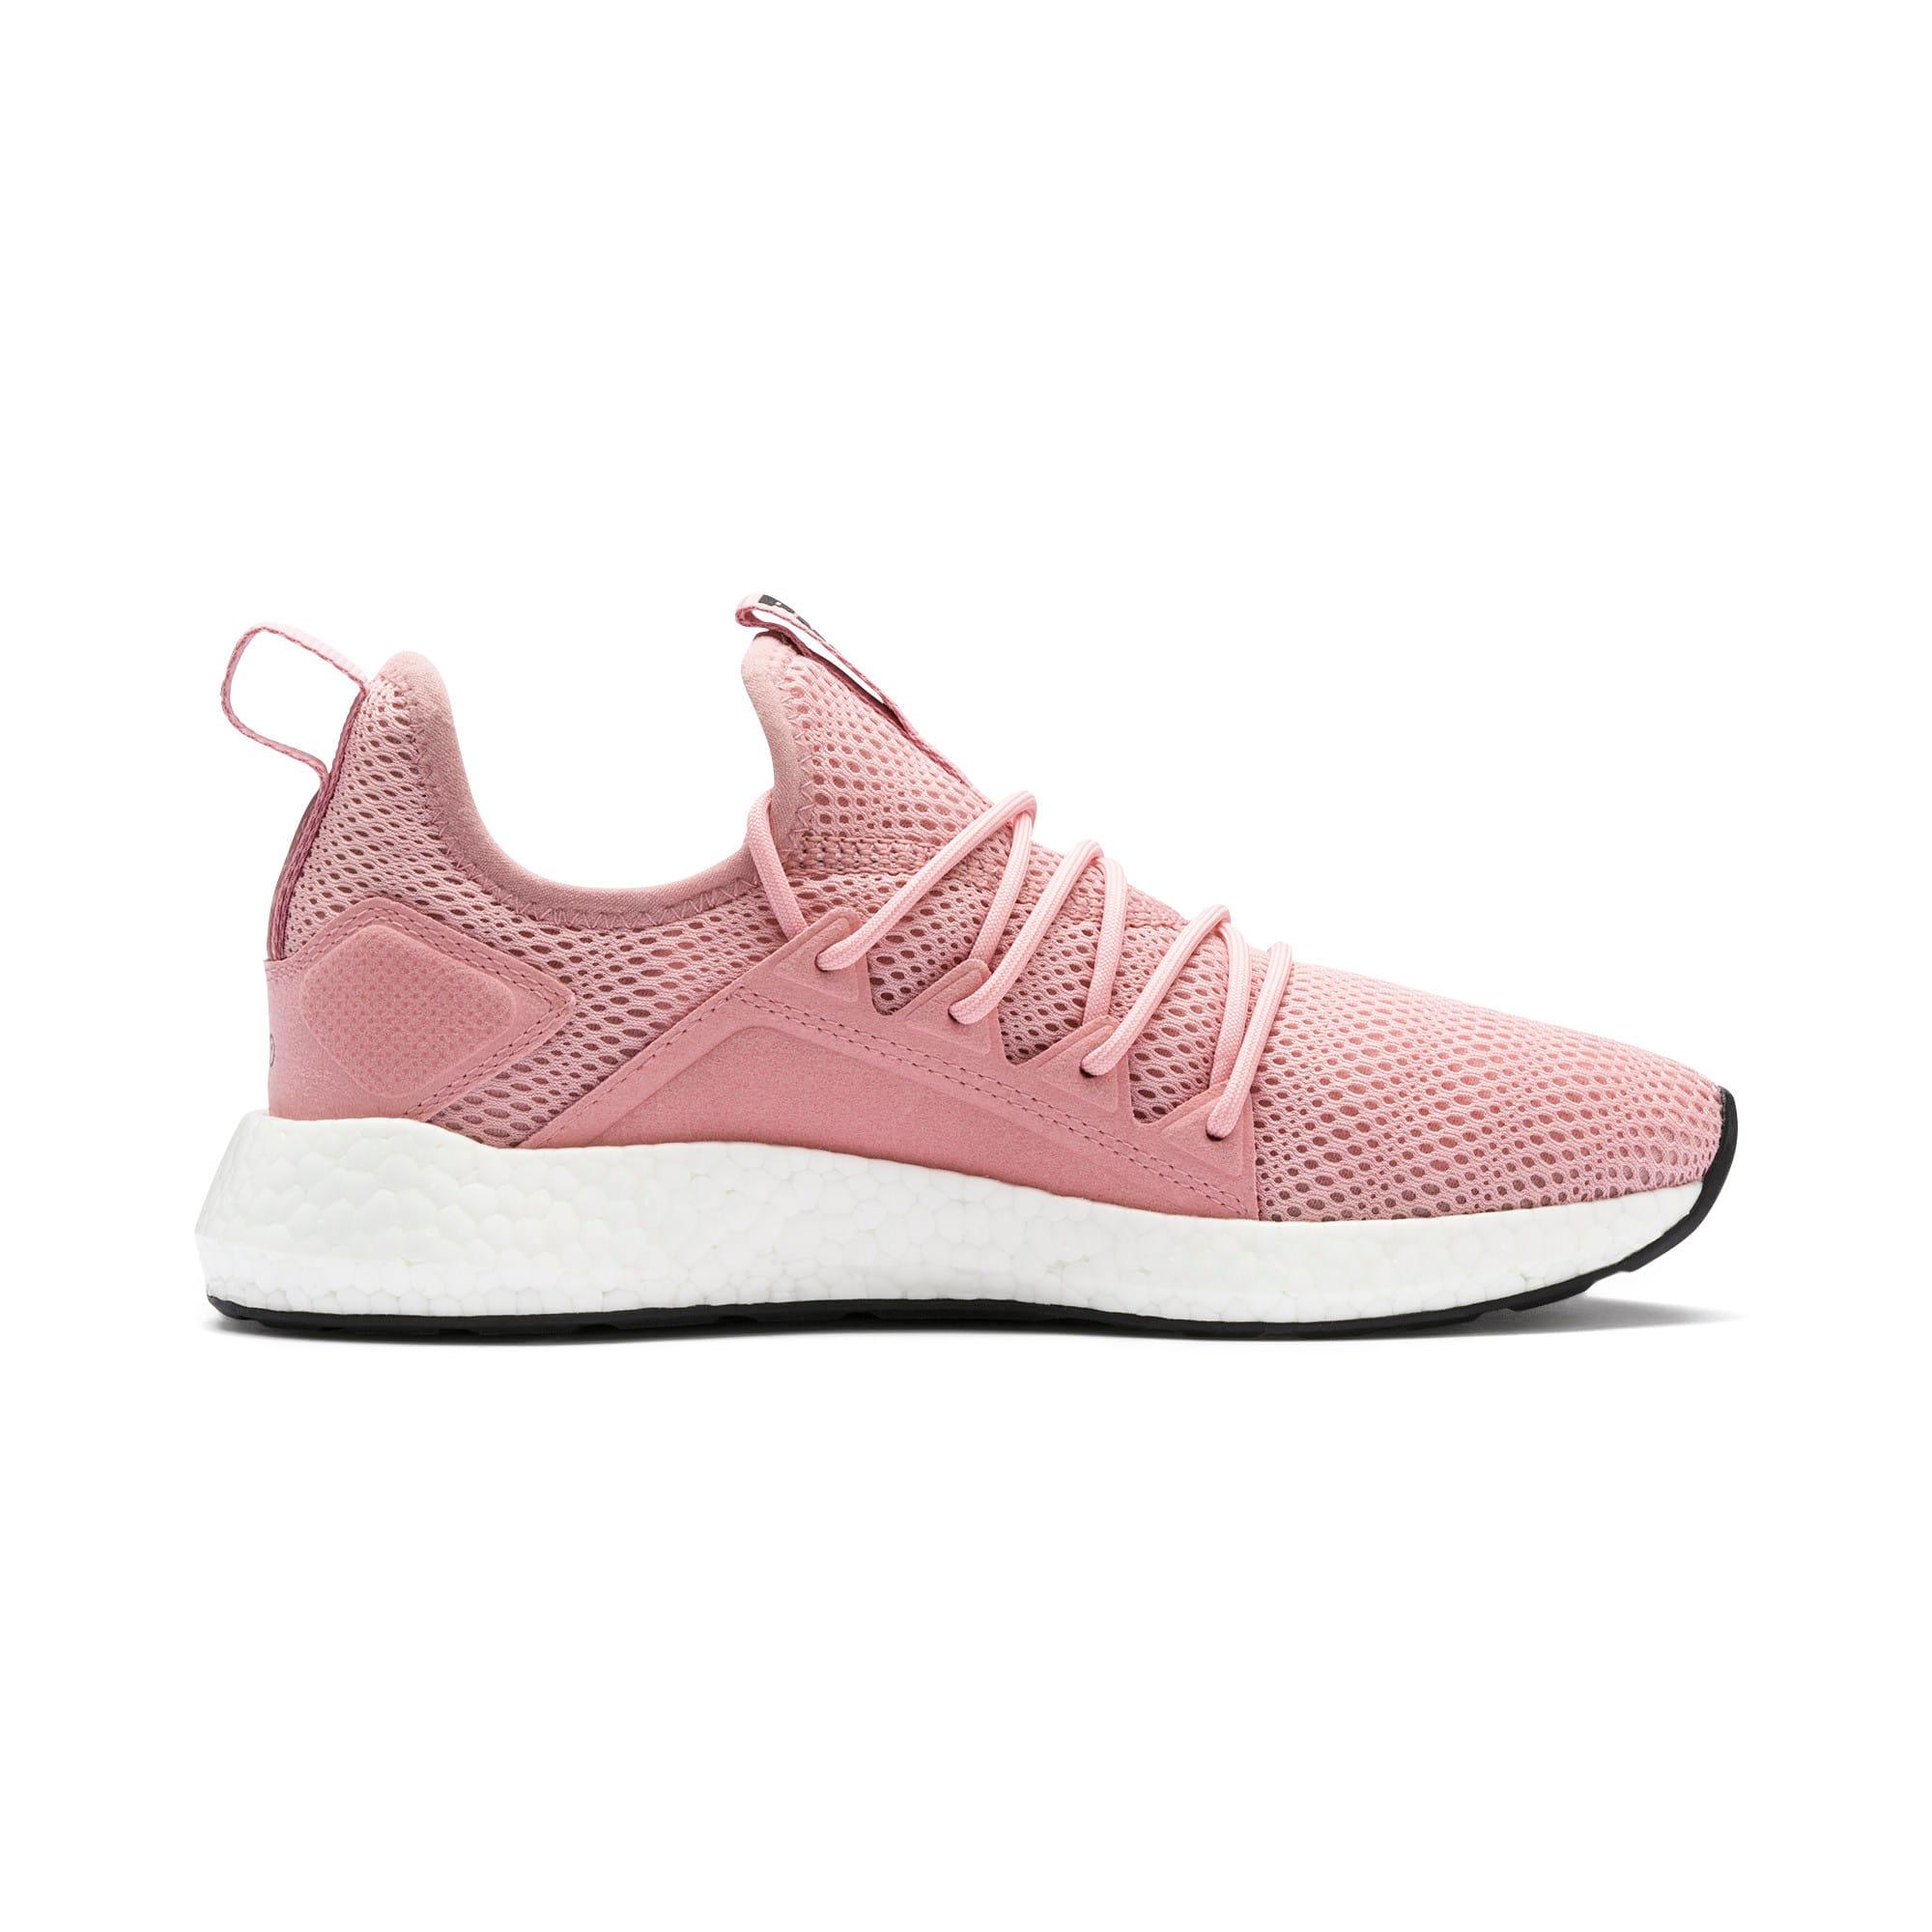 Thumbnail 6 of NRGY Neko Shift Women's Running Shoes, Bridal Rose-Puma White, medium